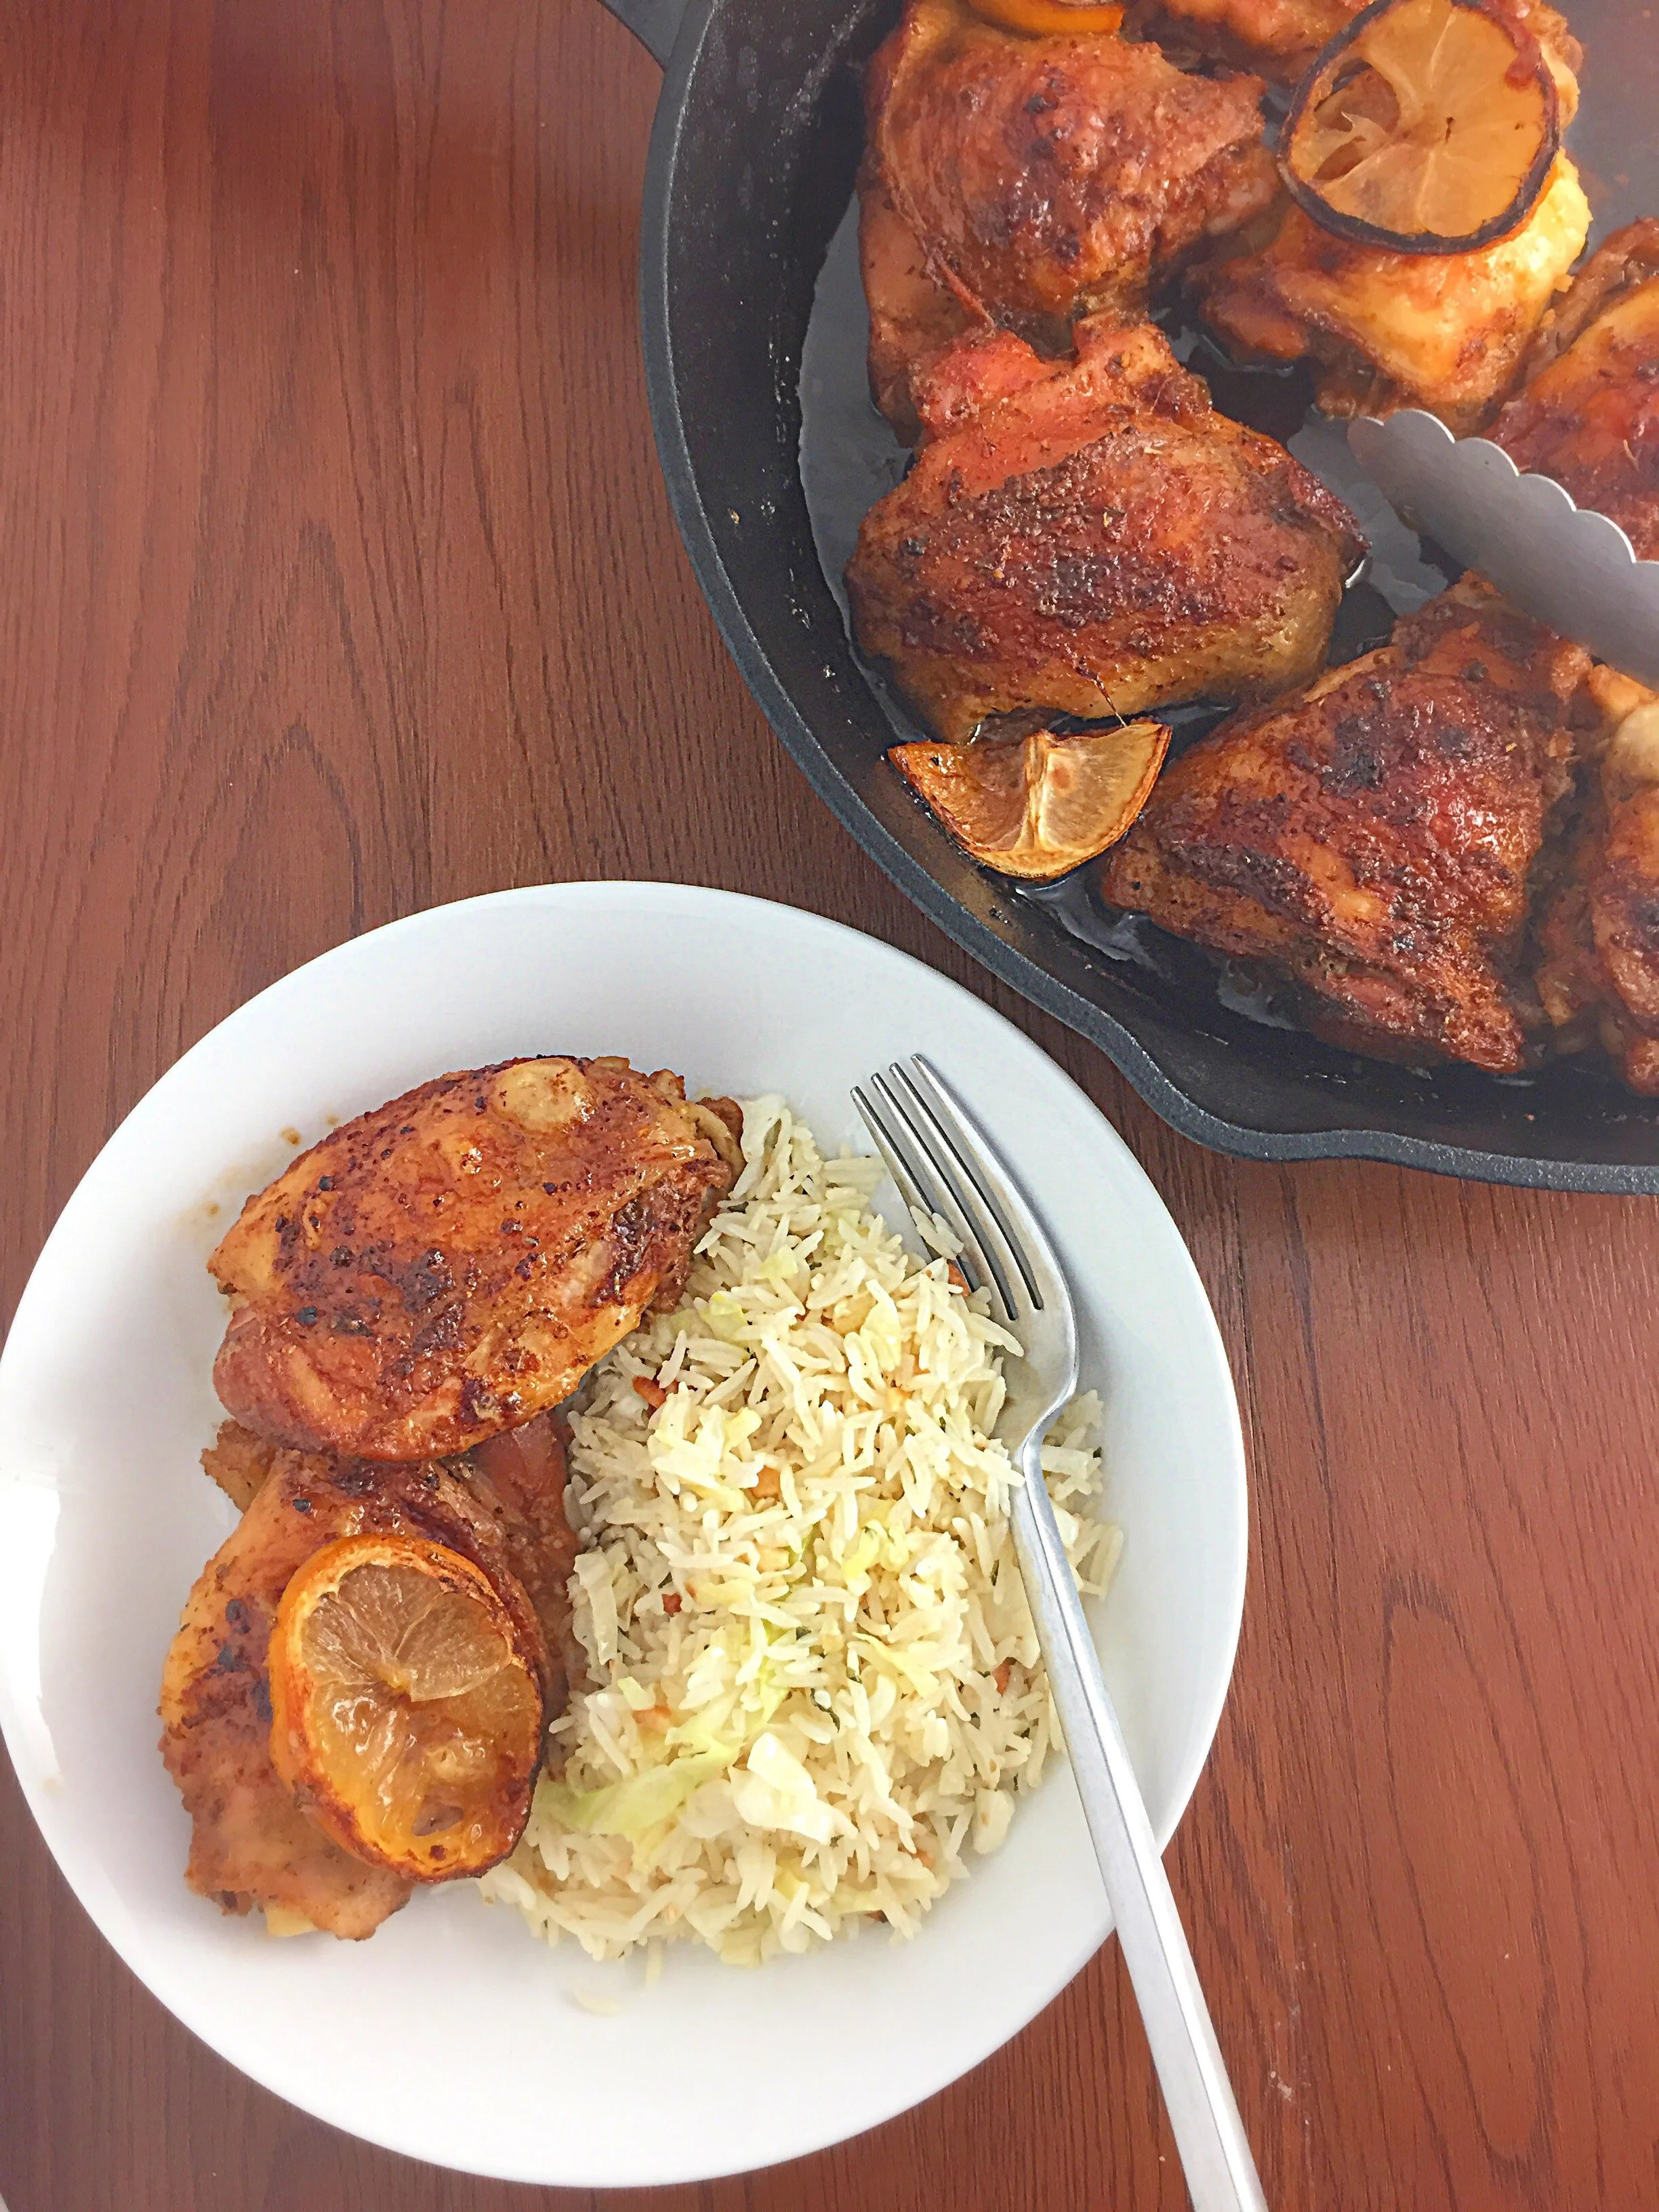 Lemon-Honey-Glazed Roast Chicken